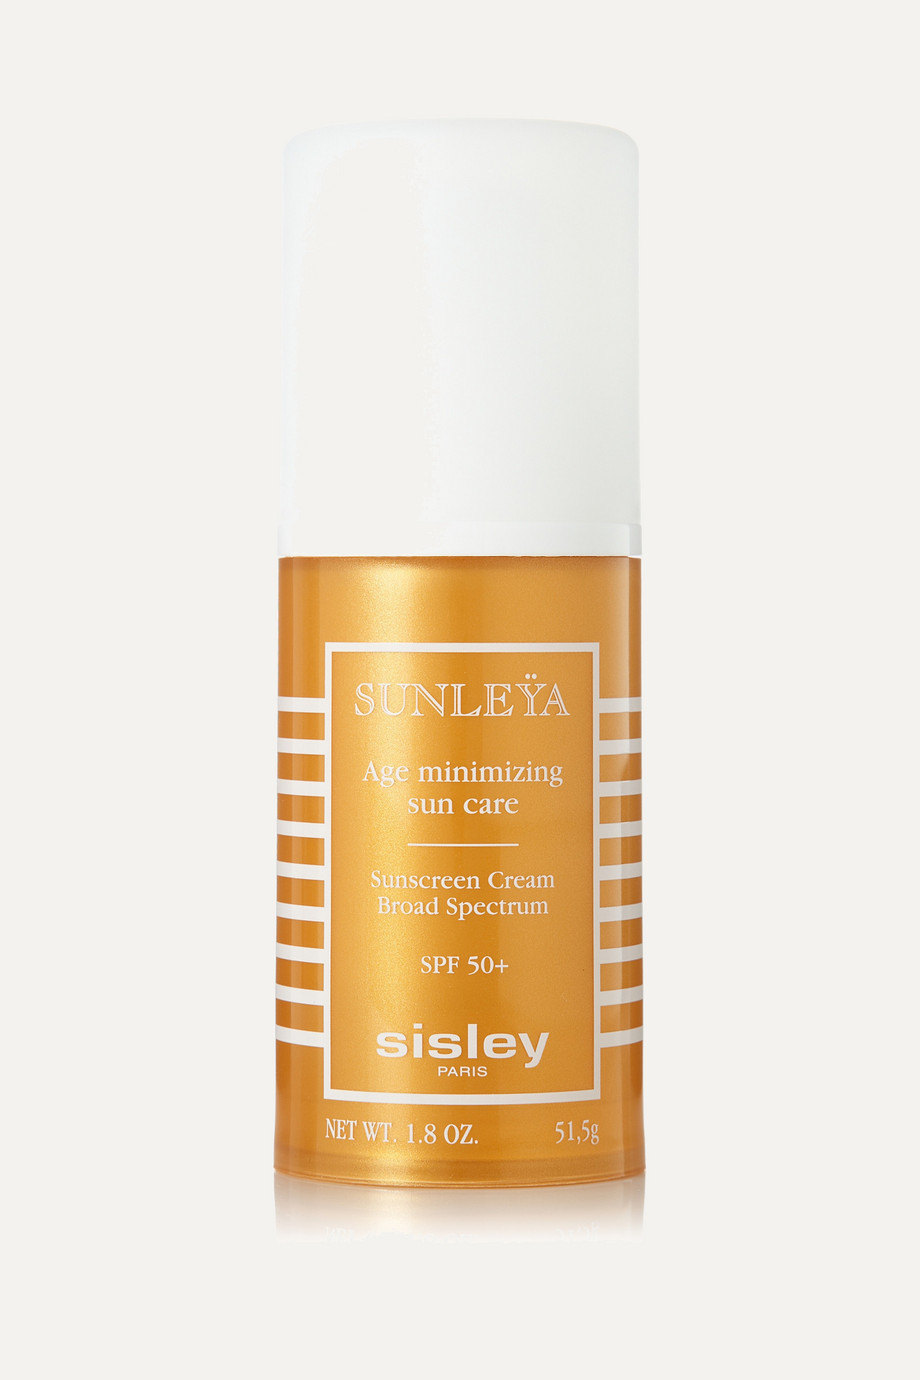 Sisley SPF50 Sunleÿa Age Minimizing Sunscreen Cream Broad Spectrum,  51.5g